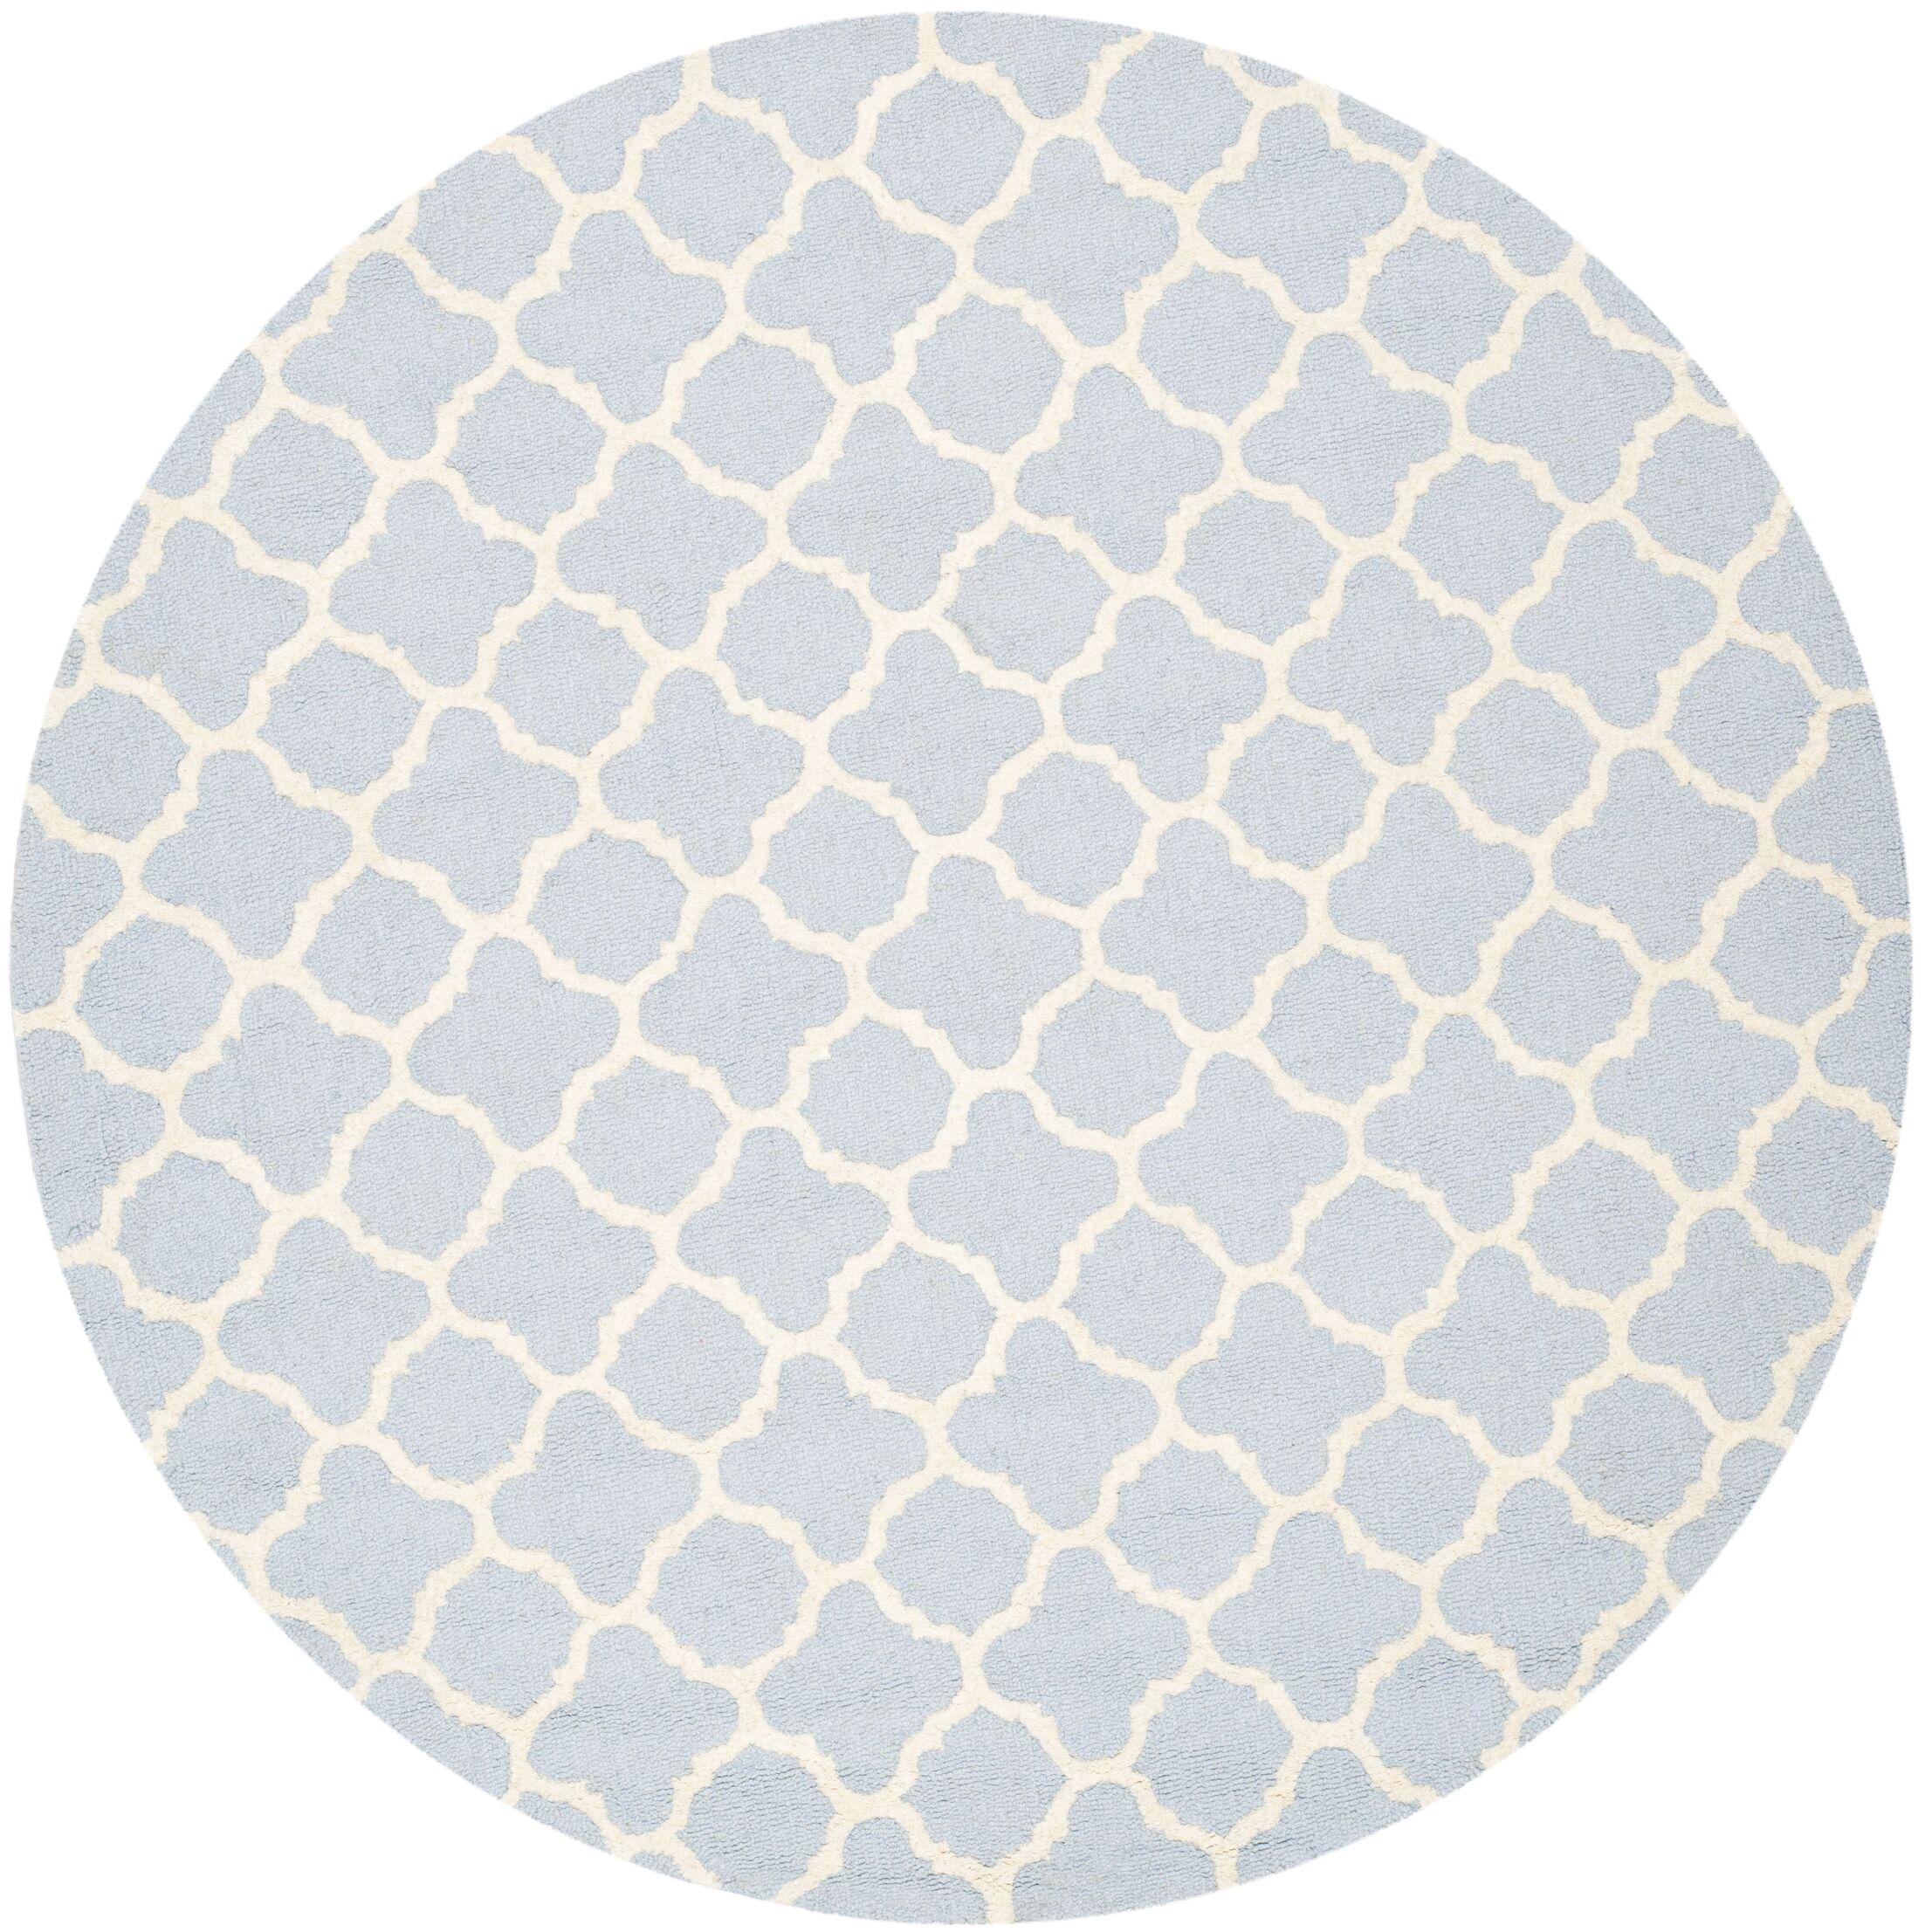 Martins Light Blue / Ivory Area Rug Rug Size: Round 4'